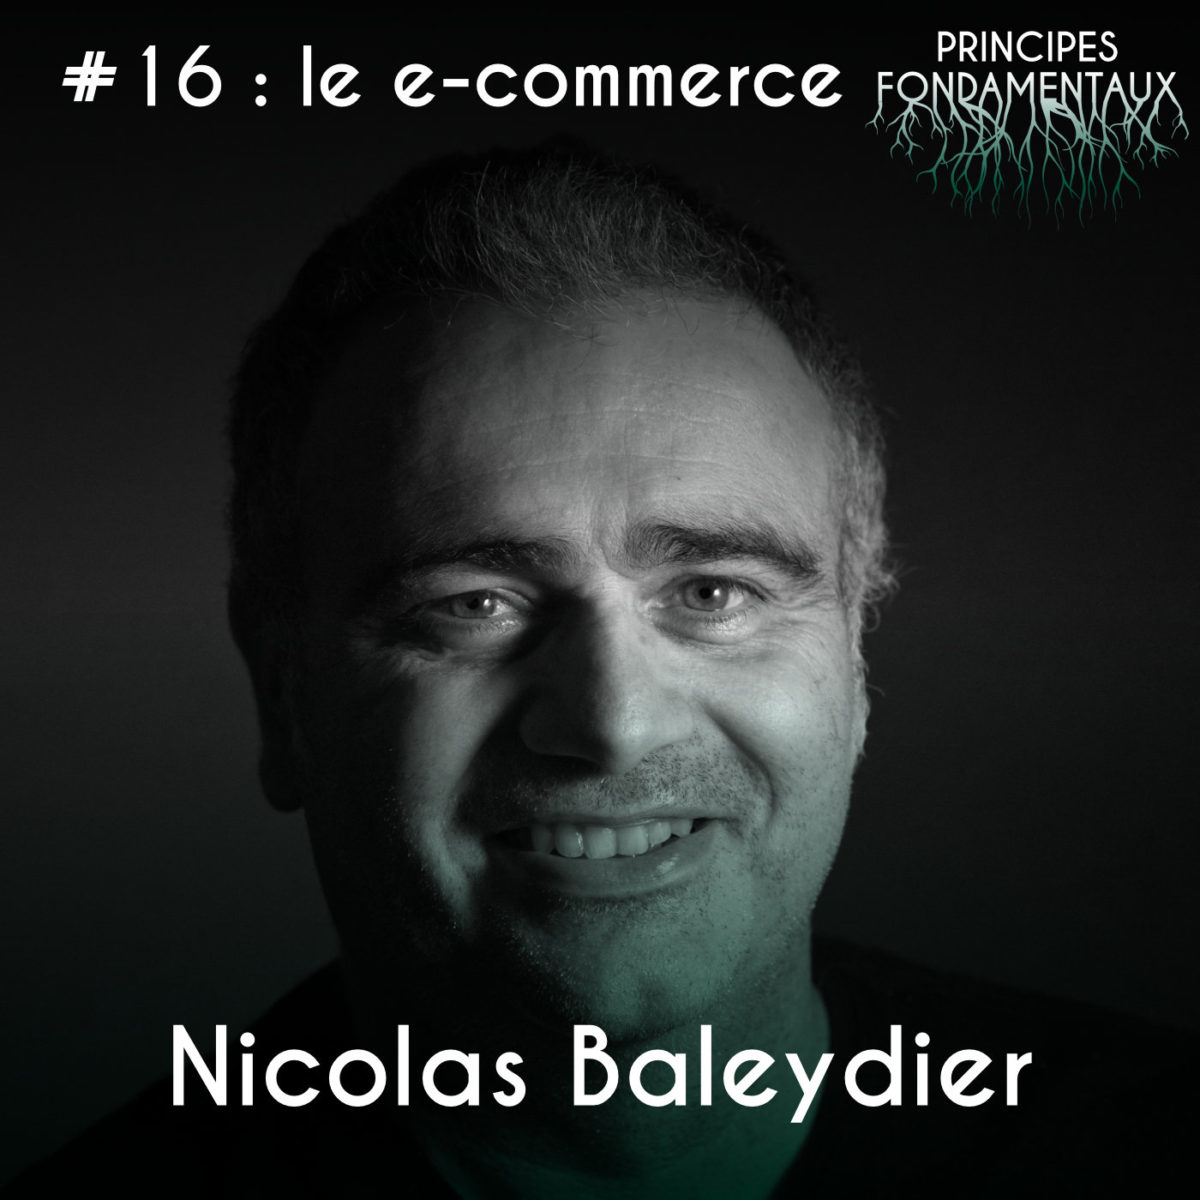 Couverture Podcast #16 Nicolas Baleydier